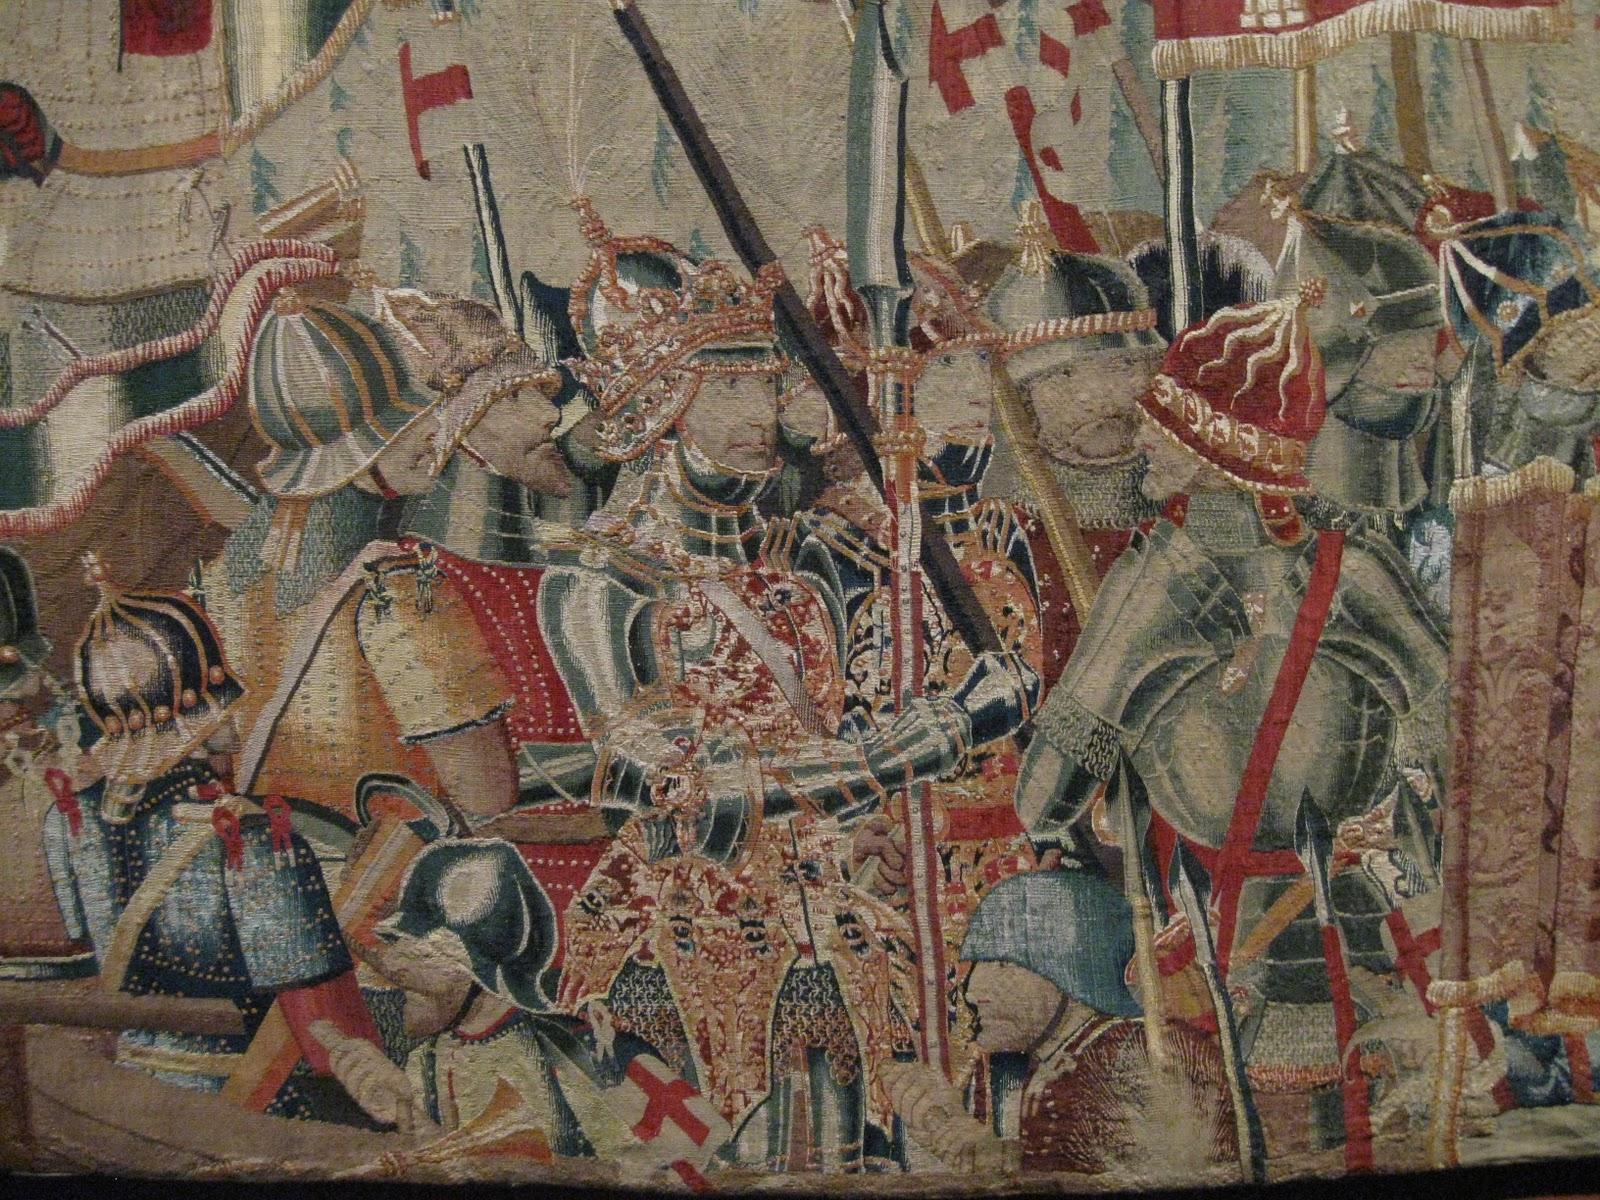 Washington Speaks 15th Century Tapestries Portray